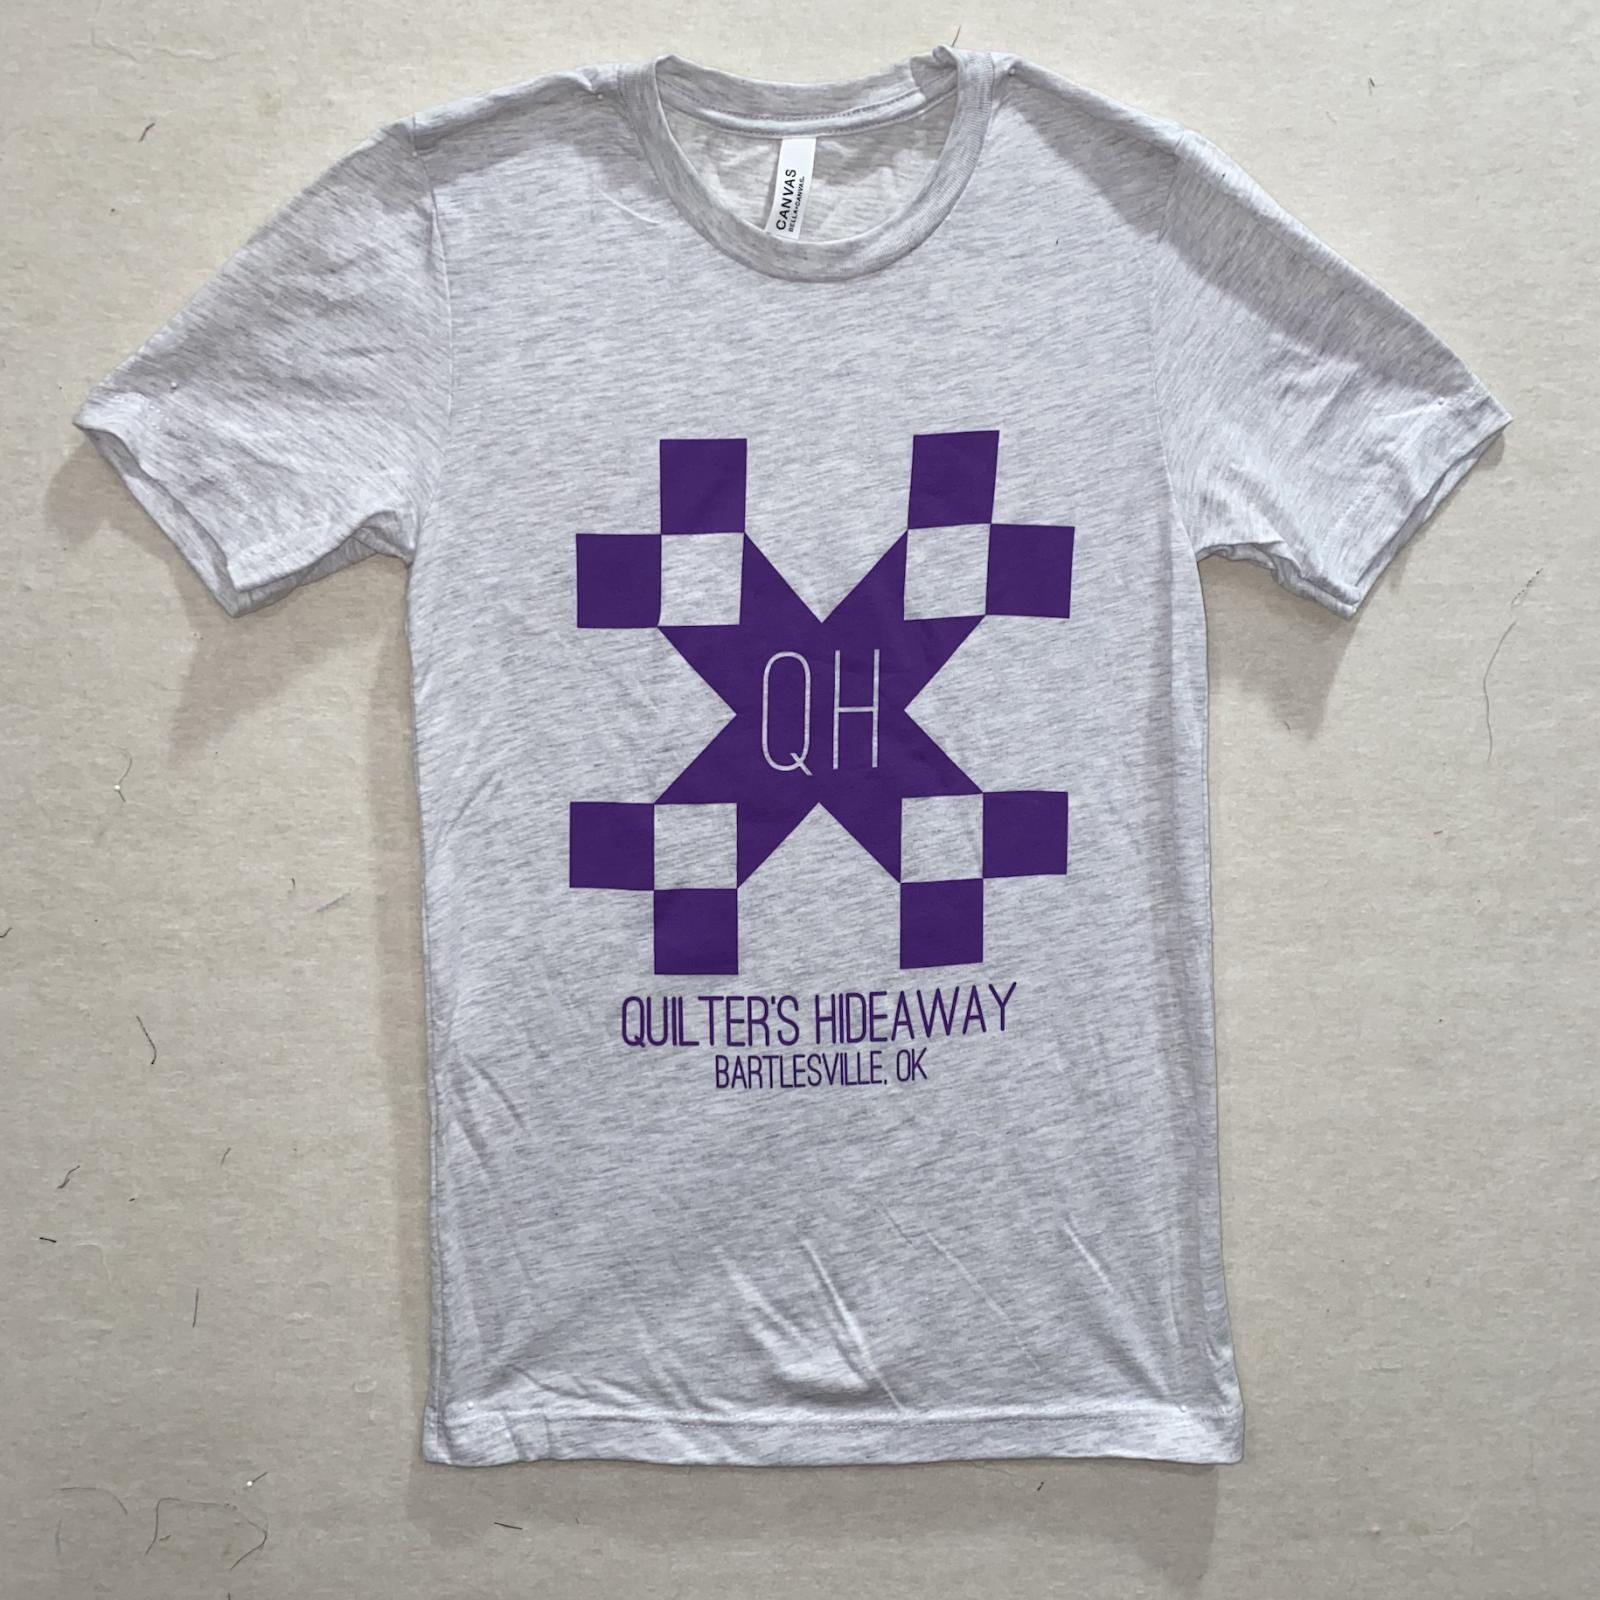 QH Ash Short Sleeve T Shirt - Extra Small